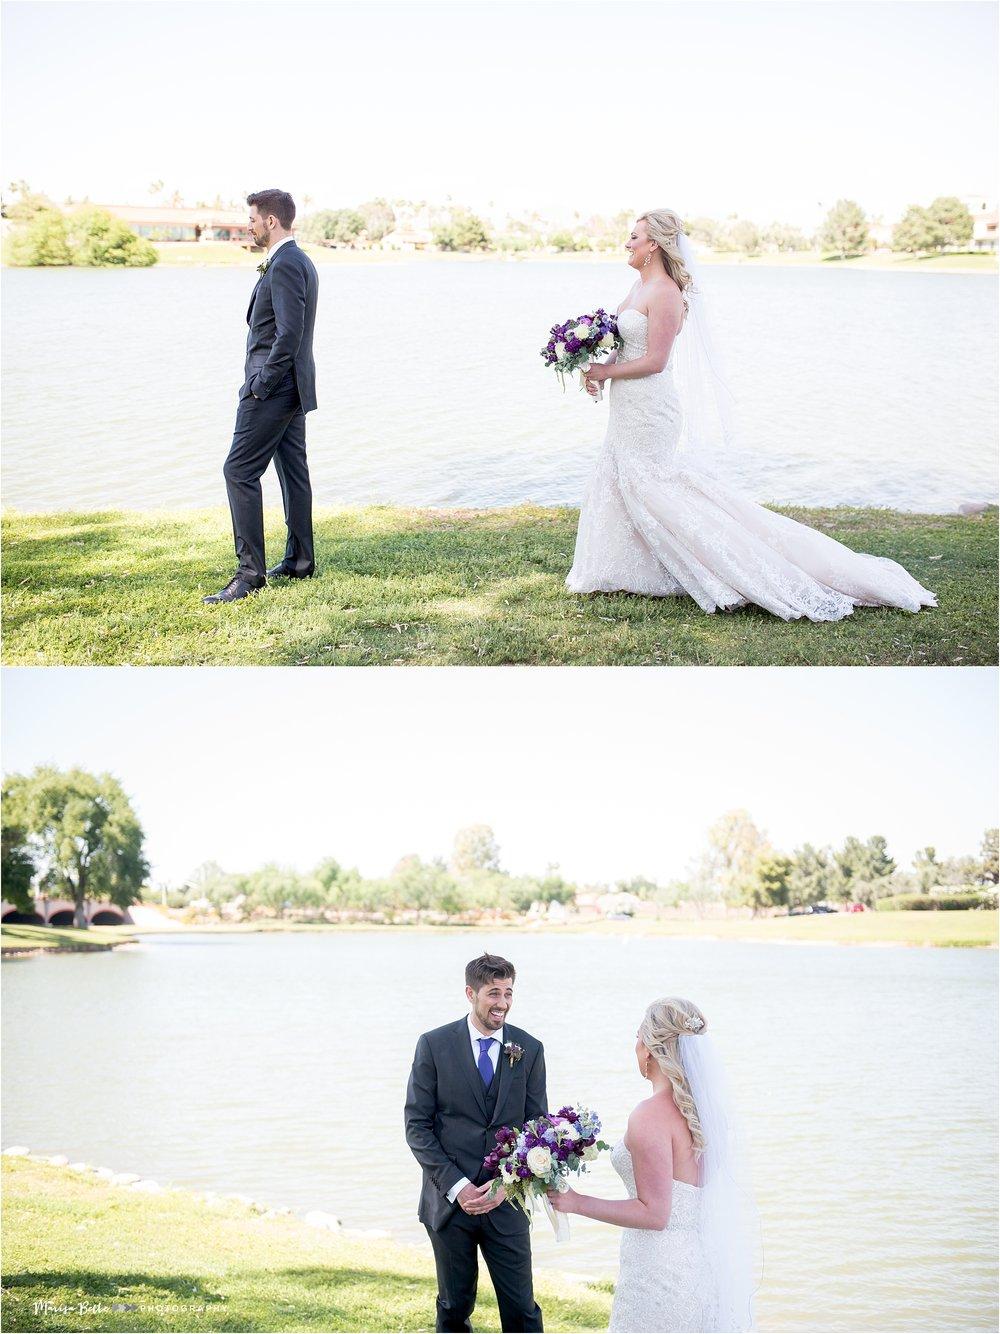 Arizona | Phoenix Wedding Photographer | www.marisabellephotography.com-45.jpg